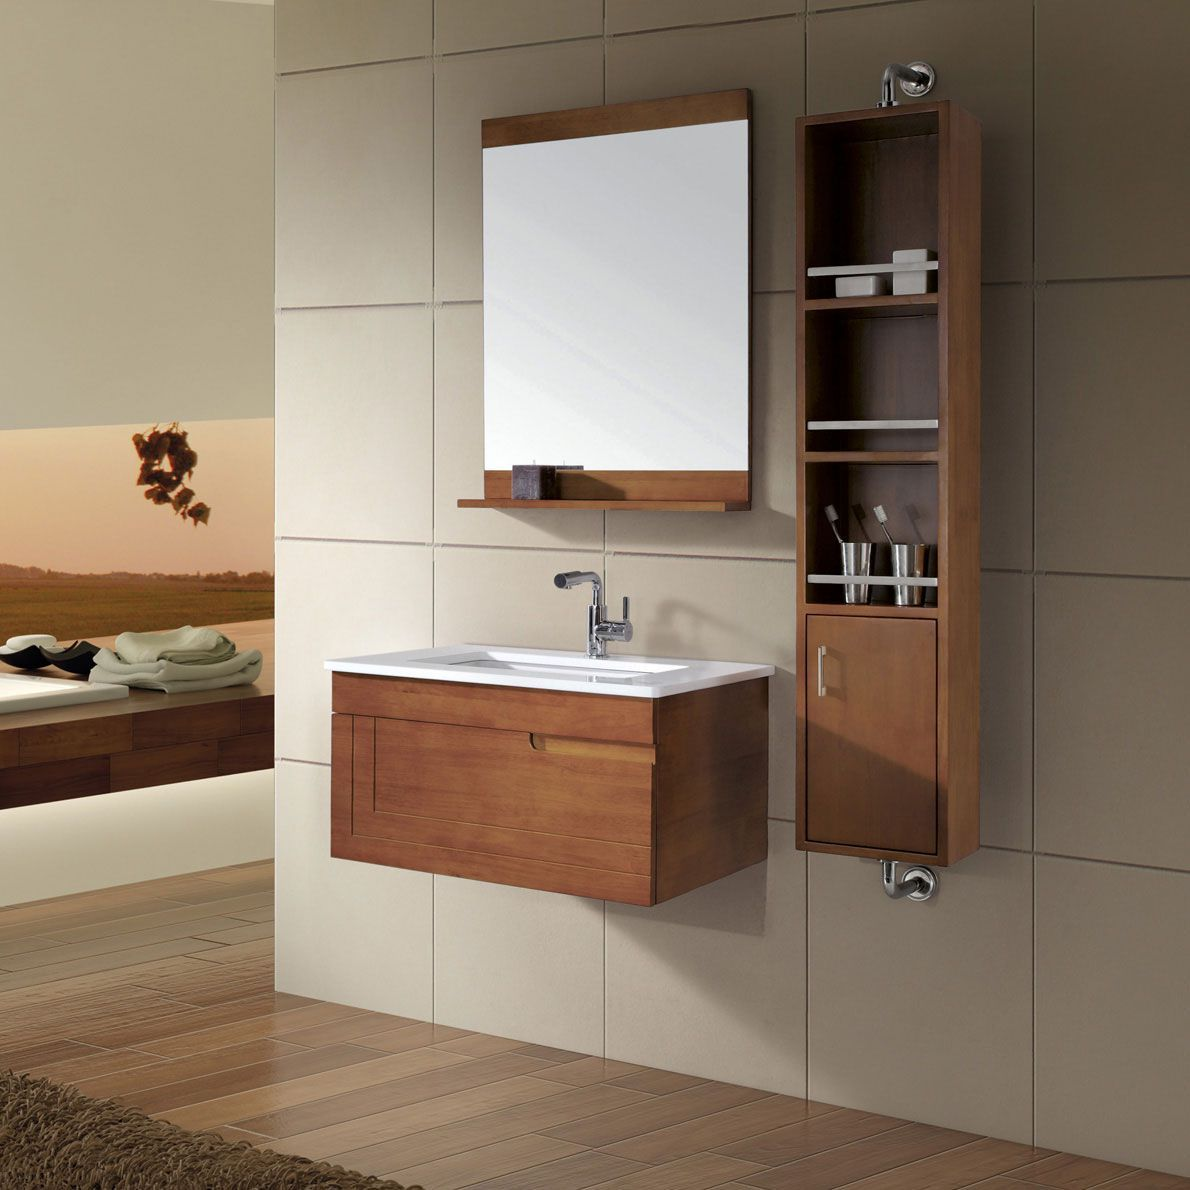 Vanity Designs For Small Bathrooms Alluring Bathroom Cabinet Ideas For Small Bathroom  Httpapokat Design Ideas